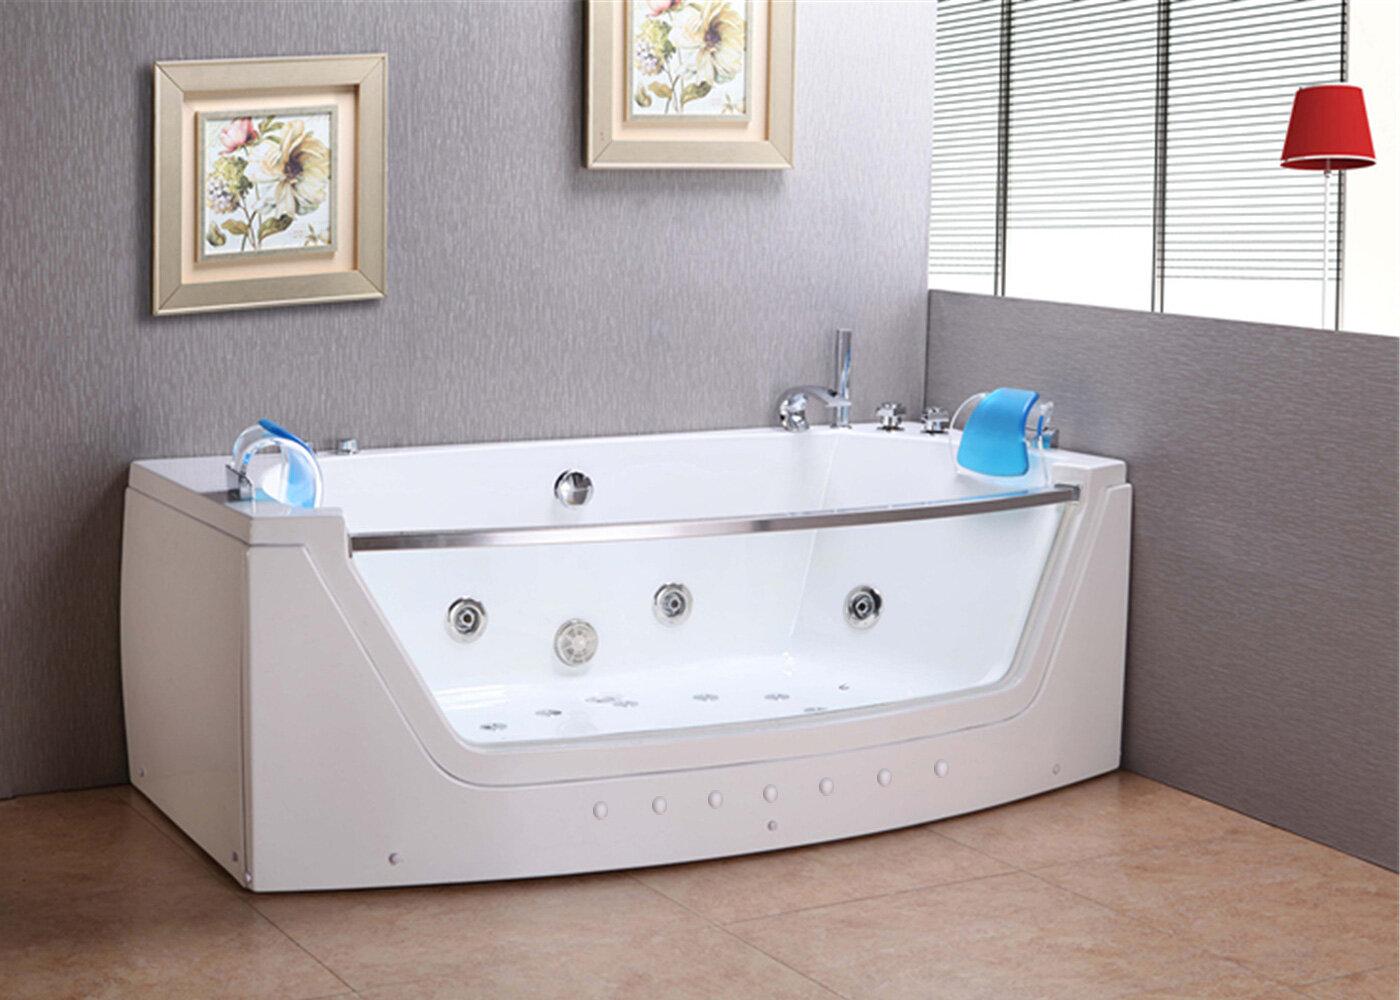 Jacuzzi Whirlpool Bath Jacuzzi.Massage Hot Tub Privilege Double Pump 71 X 35 Whirlpool Bathtub